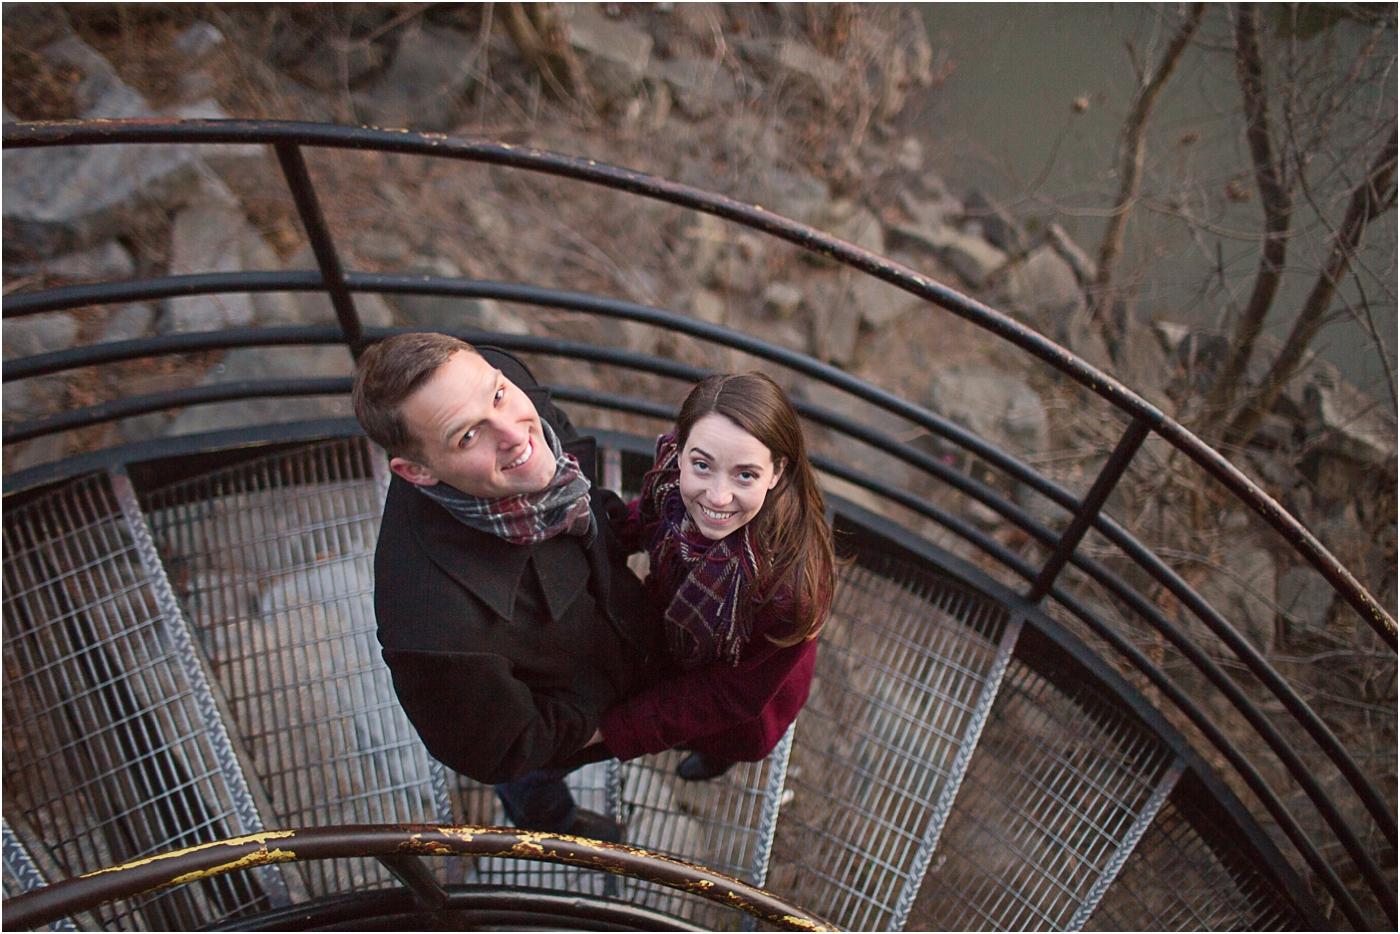 Harpers-Ferry-Engagement-52.jpg